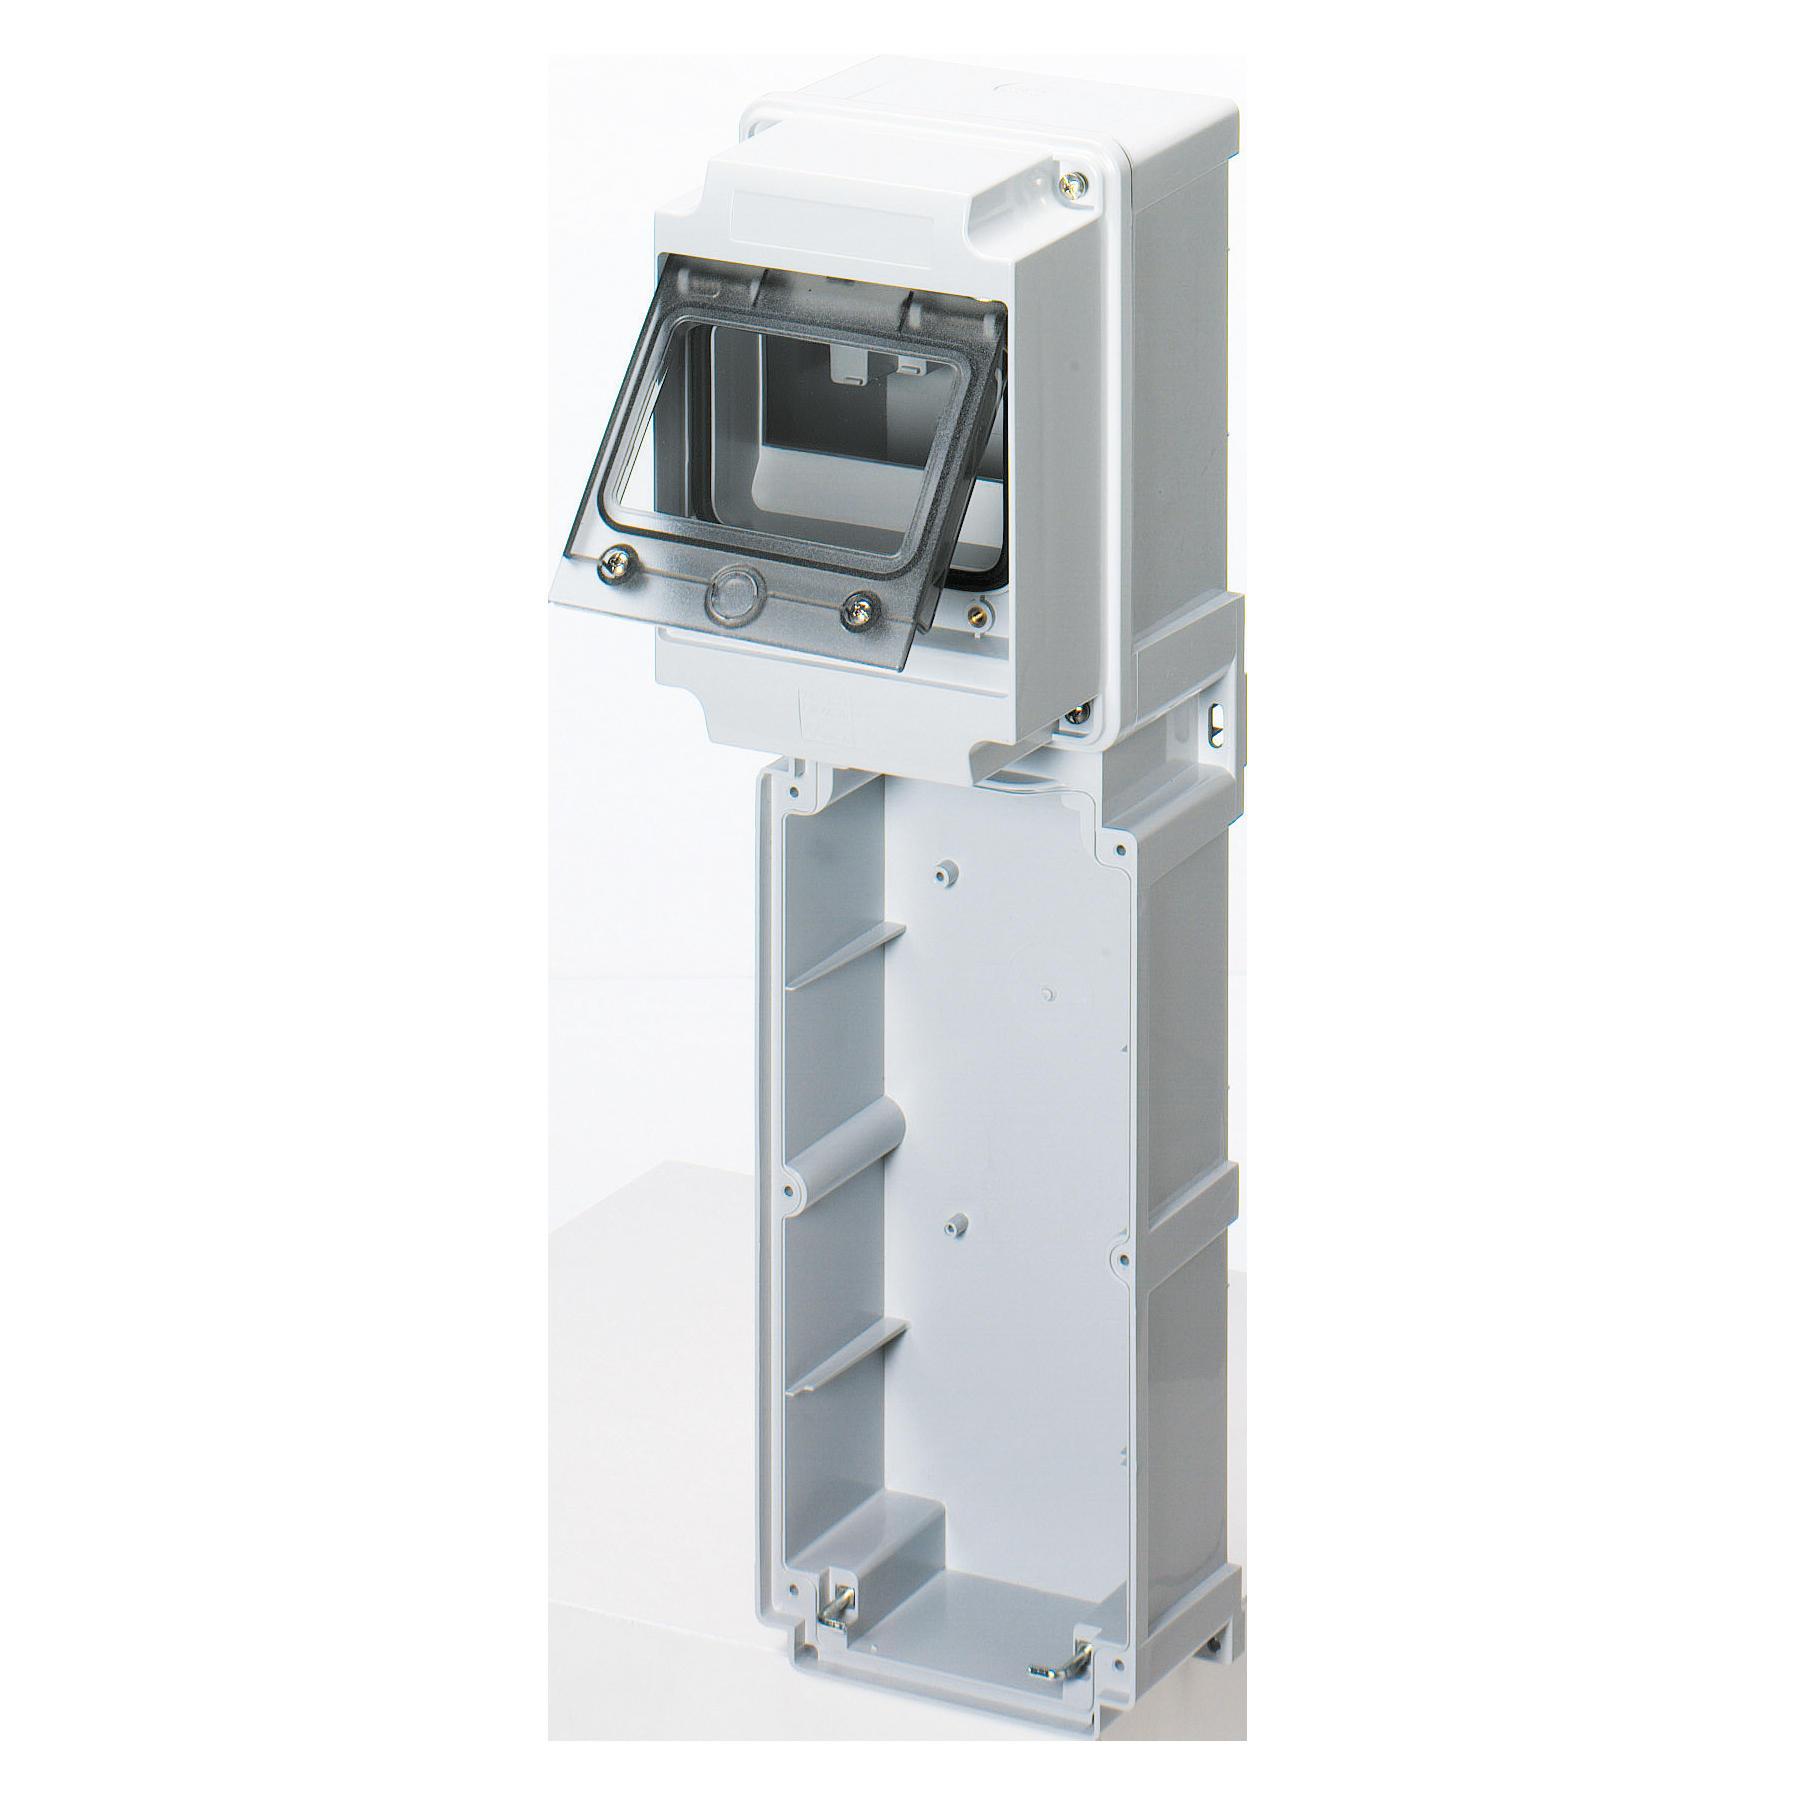 Base Gw66781 Gewiss Gt Enclosures Panels Boards Electrical Boxes